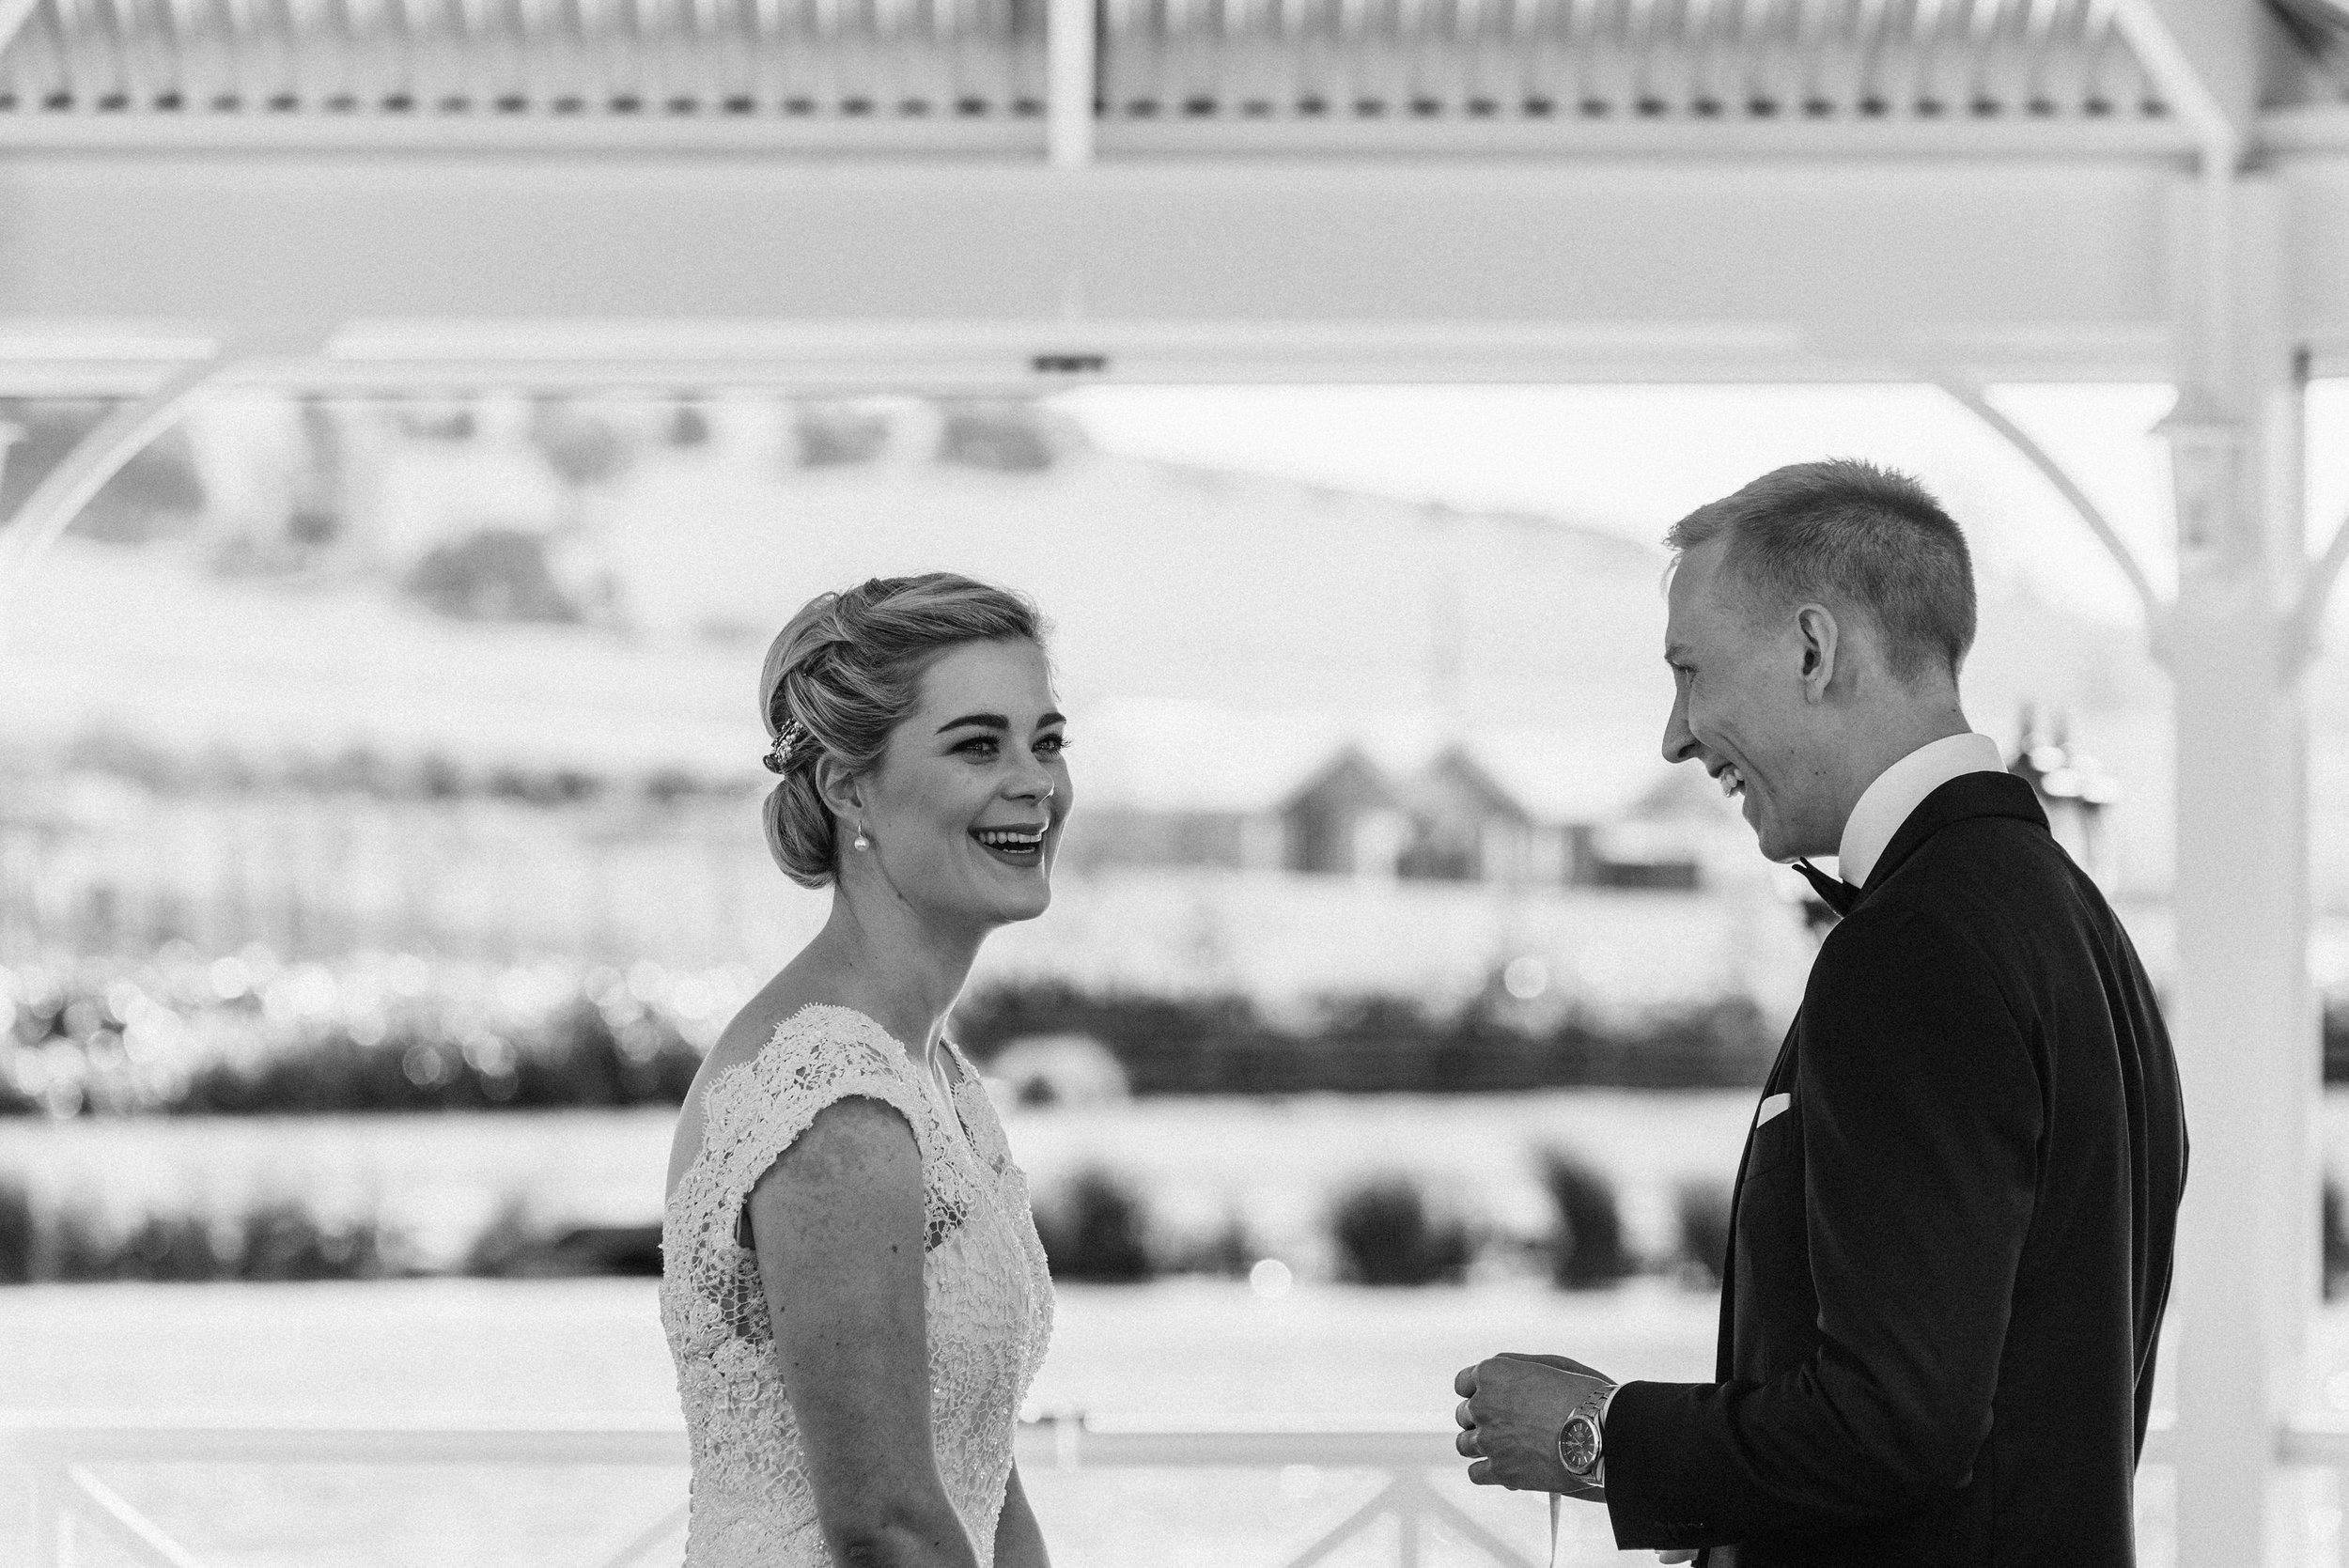 Josef-Chromy-Wedding-38.jpg